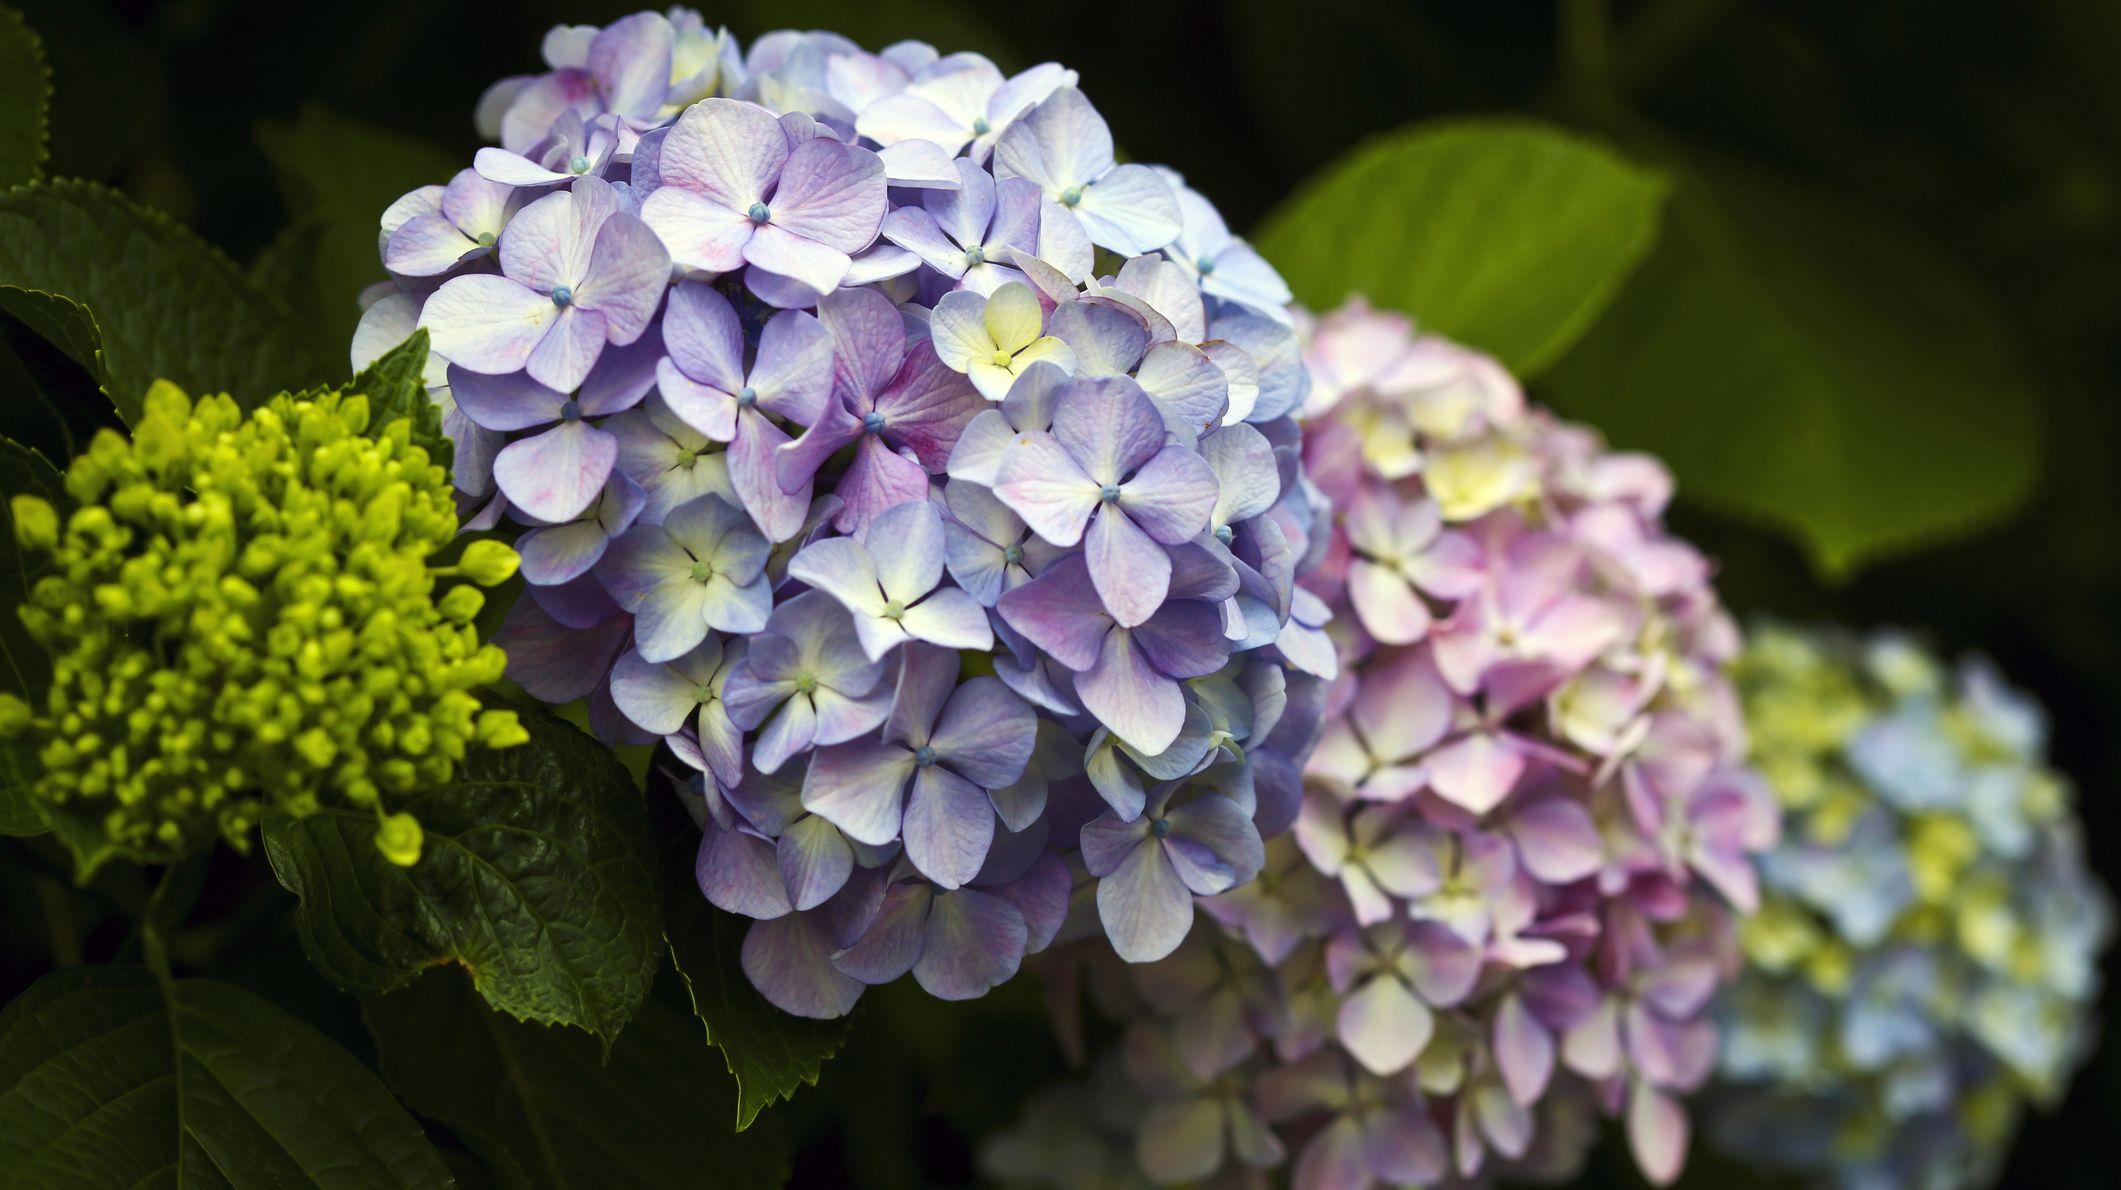 The Easy Way to Propagate Hydrangeas in Your Garden